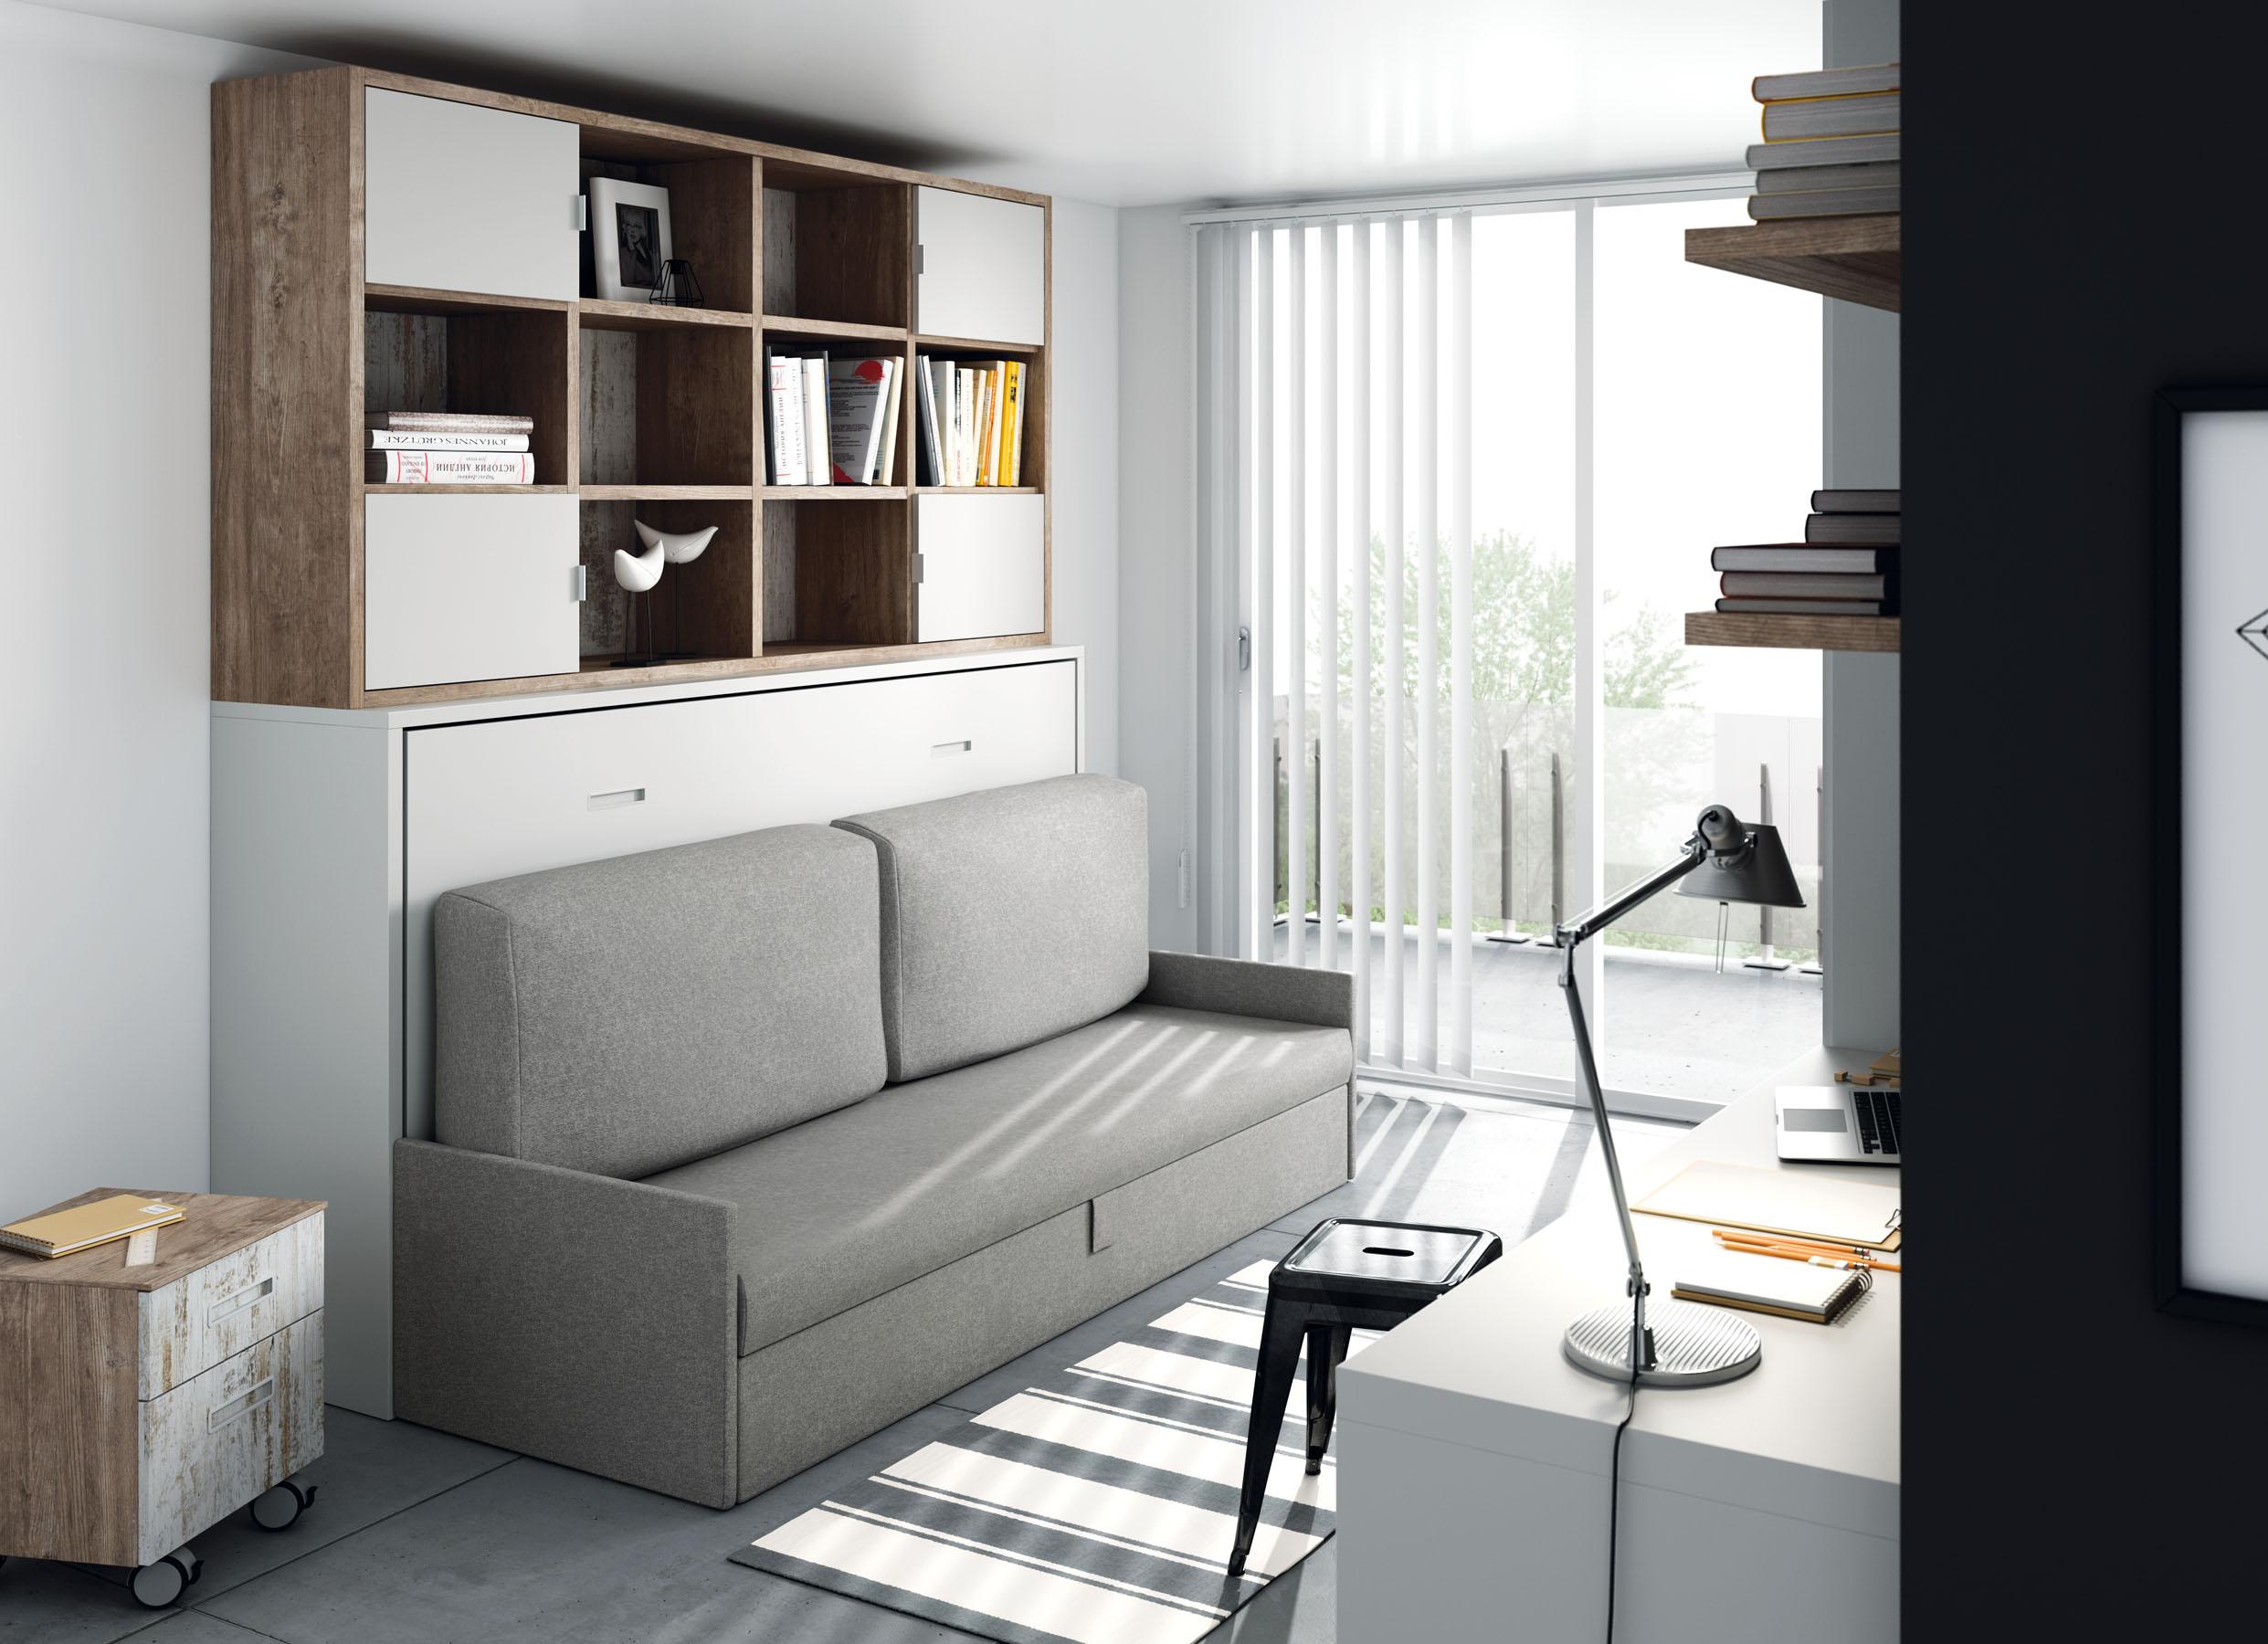 Sistemas Abatibles Qb Tegar ~ Camas Abatibles Horizontales Ikea